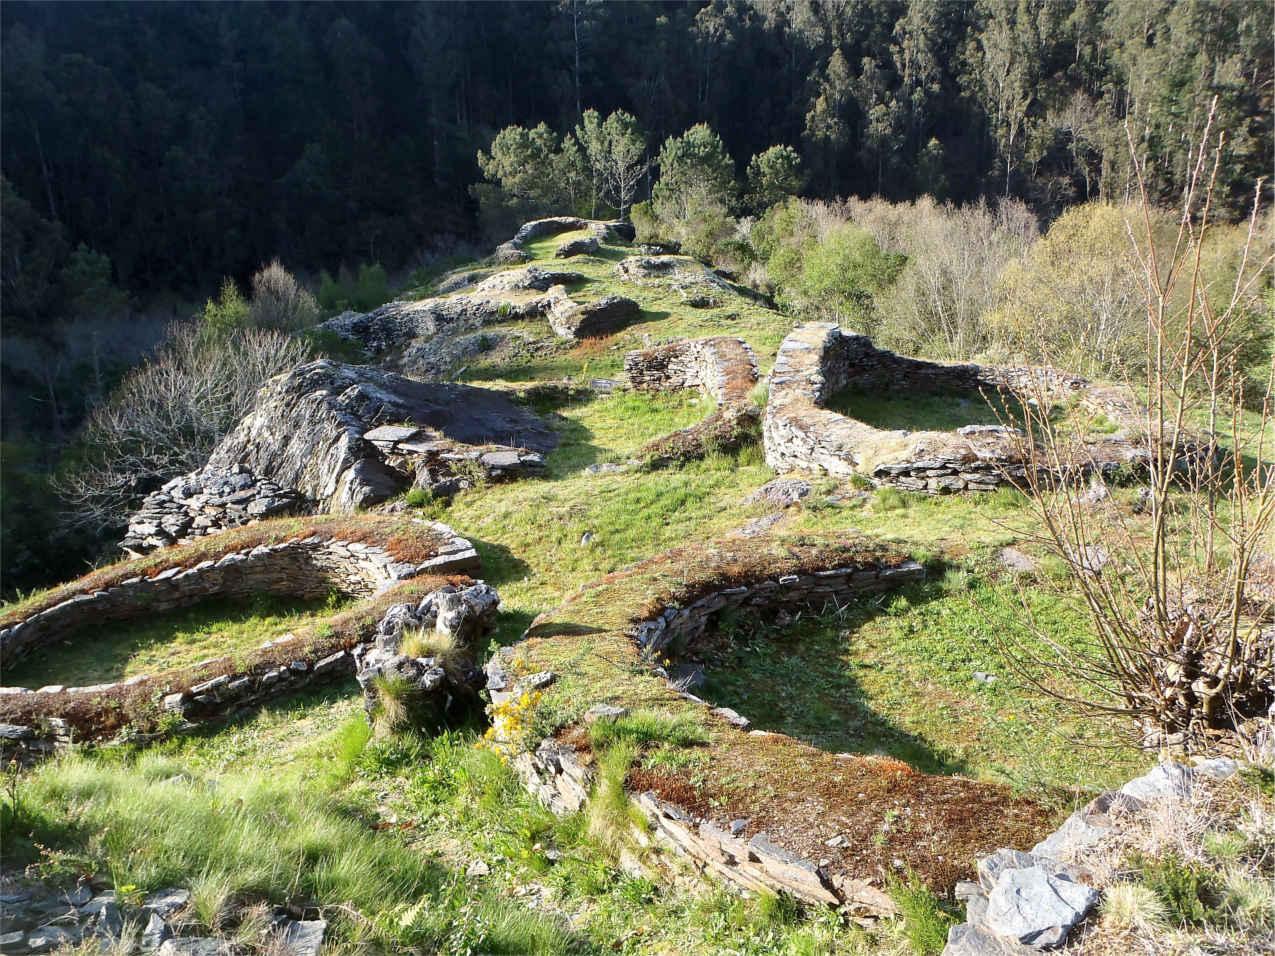 celtycka wioska: Hiszpania Północna